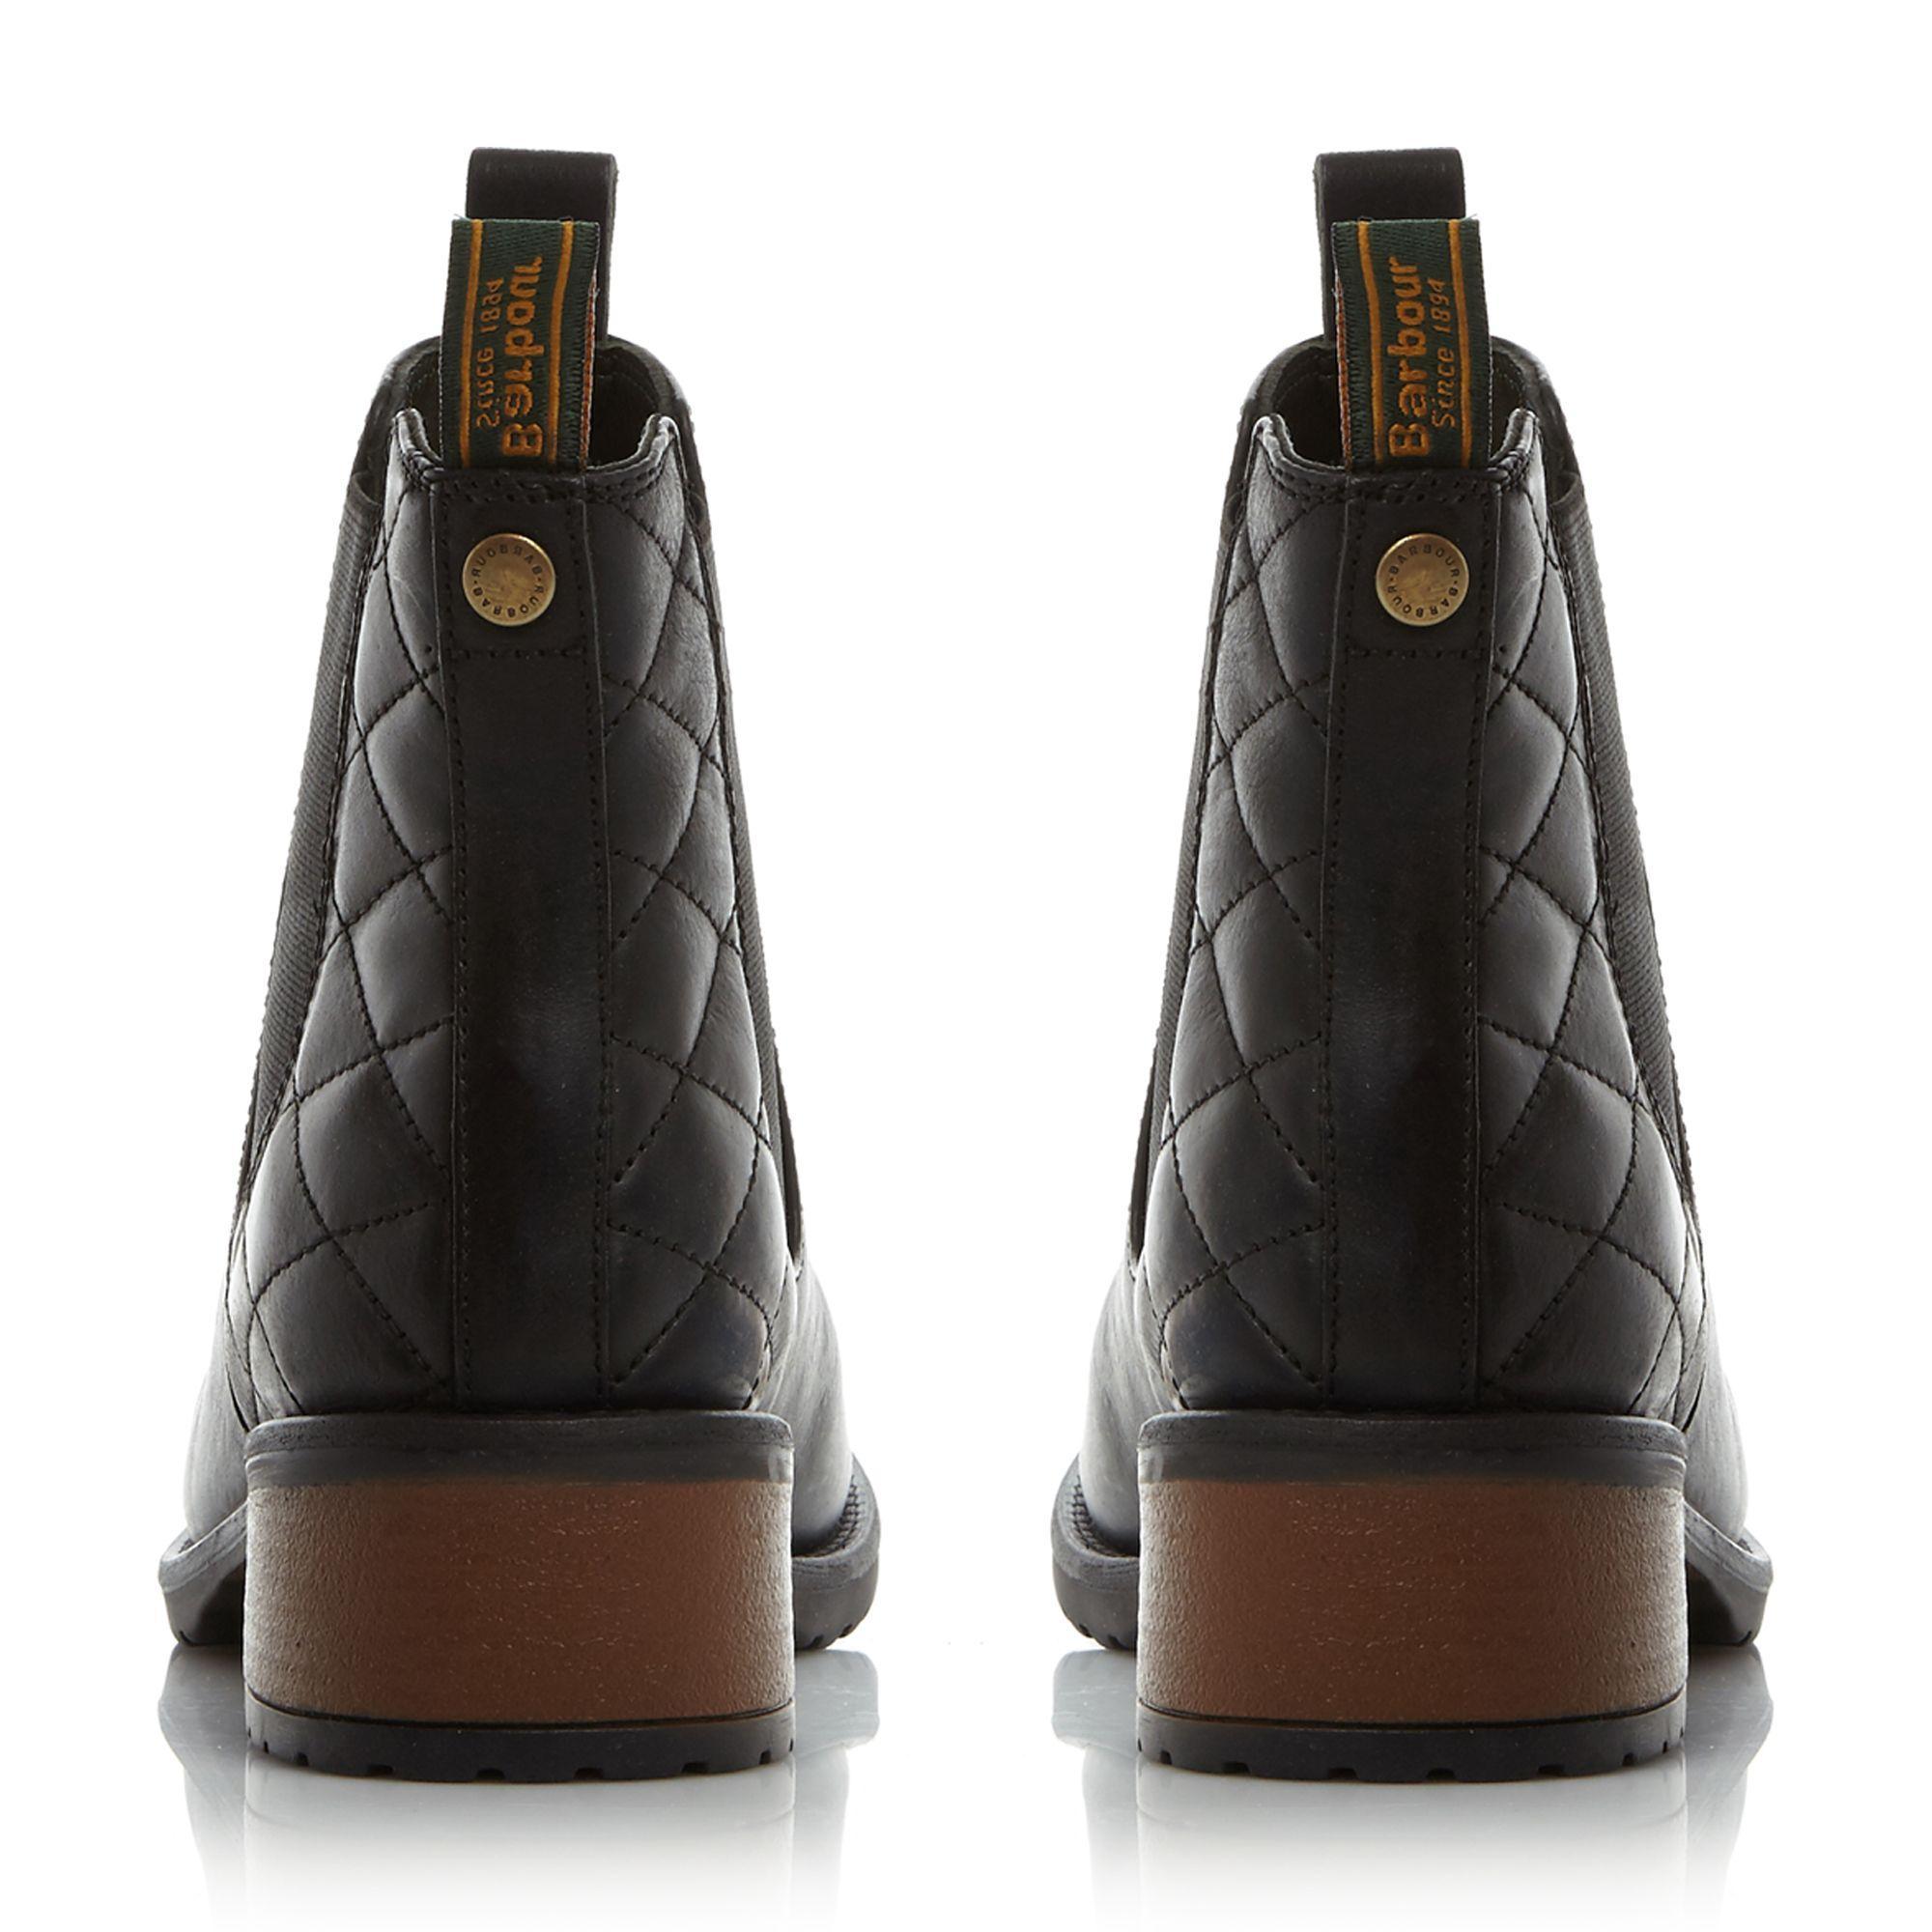 Dune Leather Latimer Plain Chelsea Boots in Black